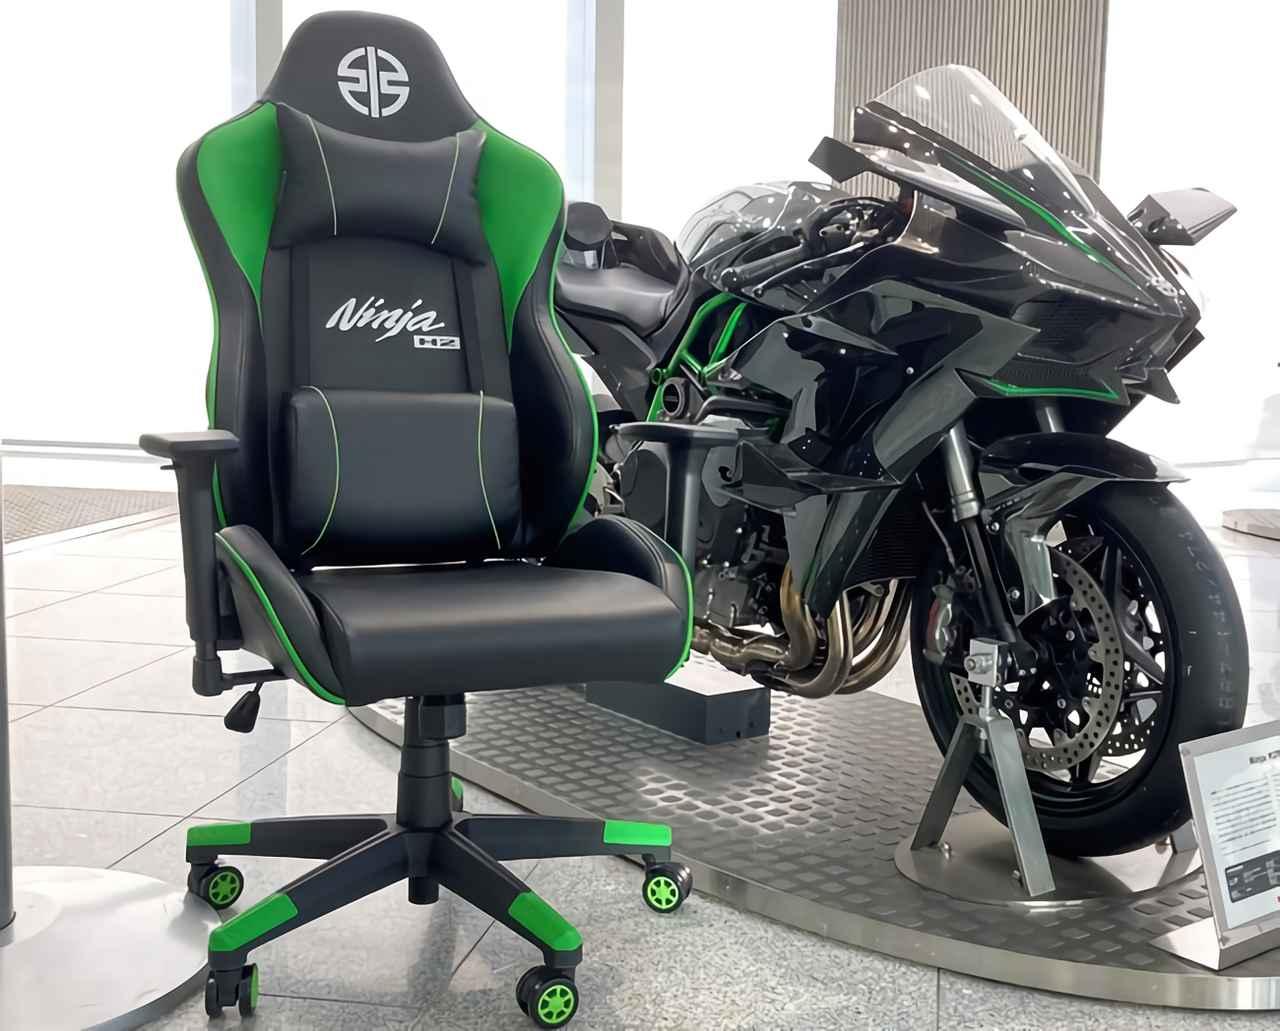 Images : 3番目の画像 - カワサキ ゲーミングチェア Ninja H2 - LAWRENCE - Motorcycle x Cars + α = Your Life.